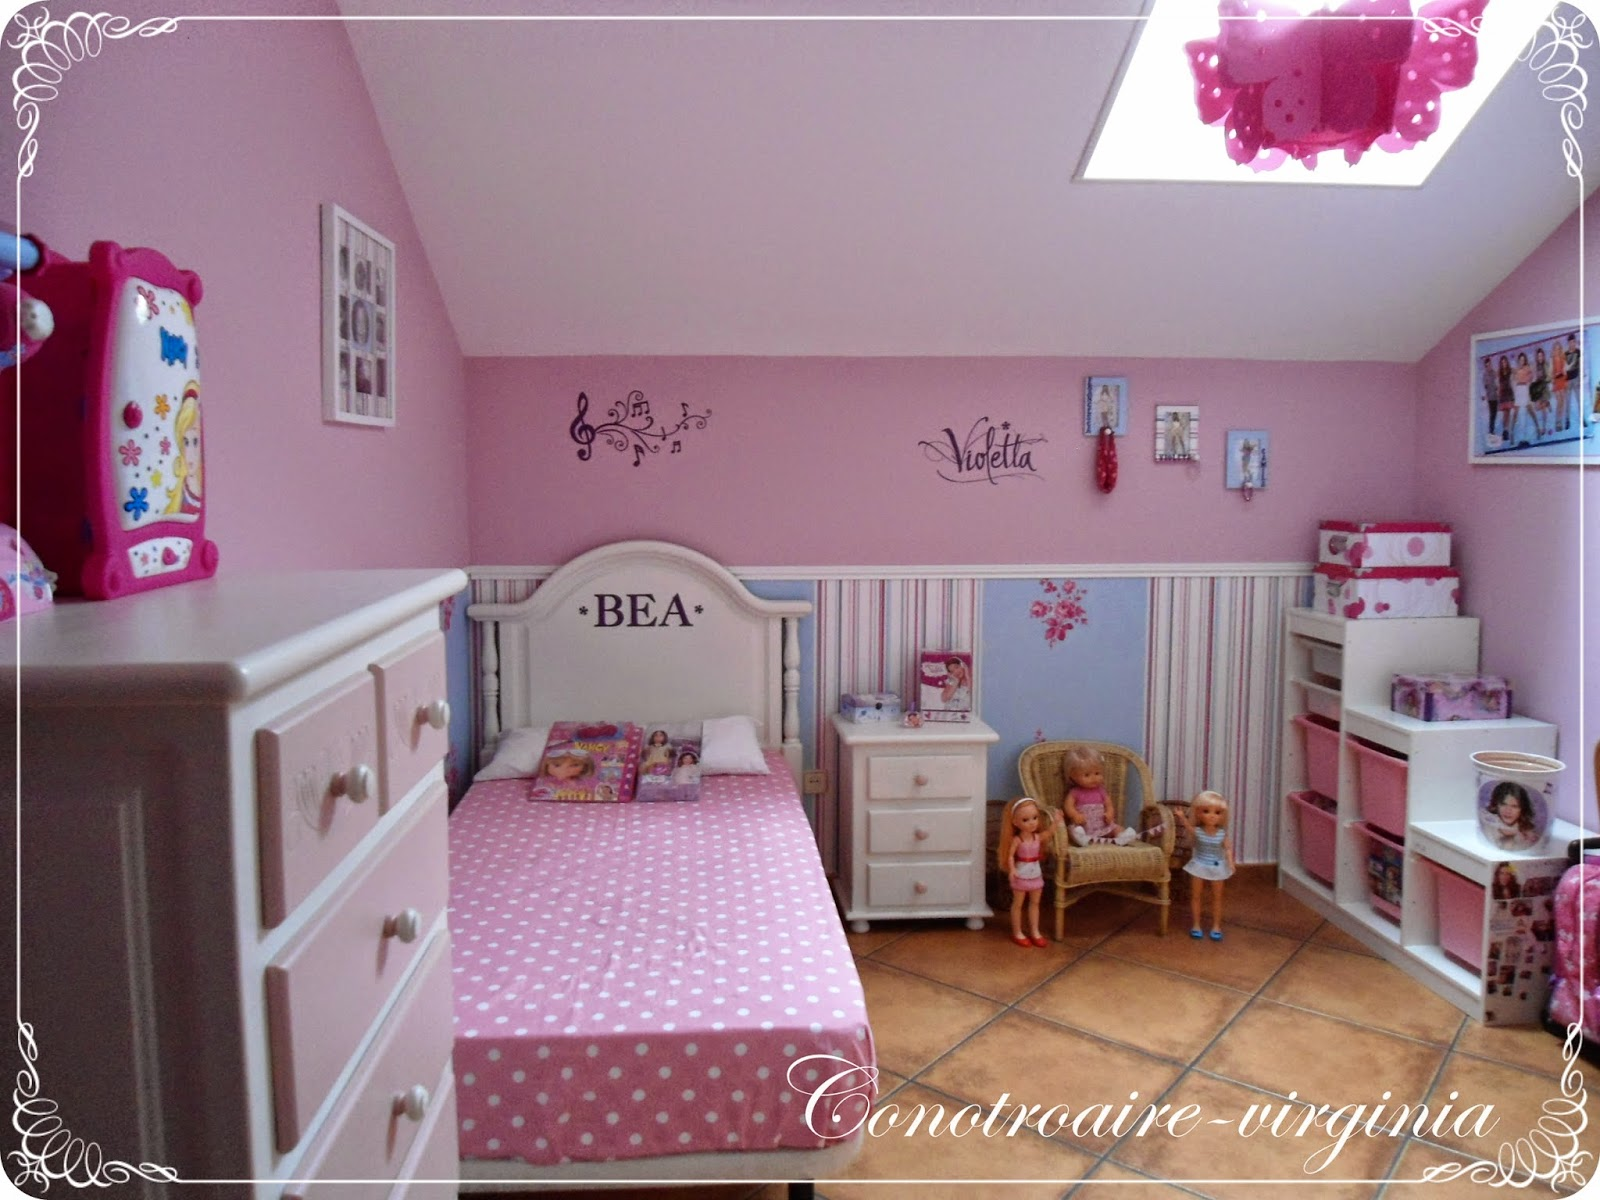 Con otro aire julio 2014 for Como decorar mi cuarto juvenil yo misma